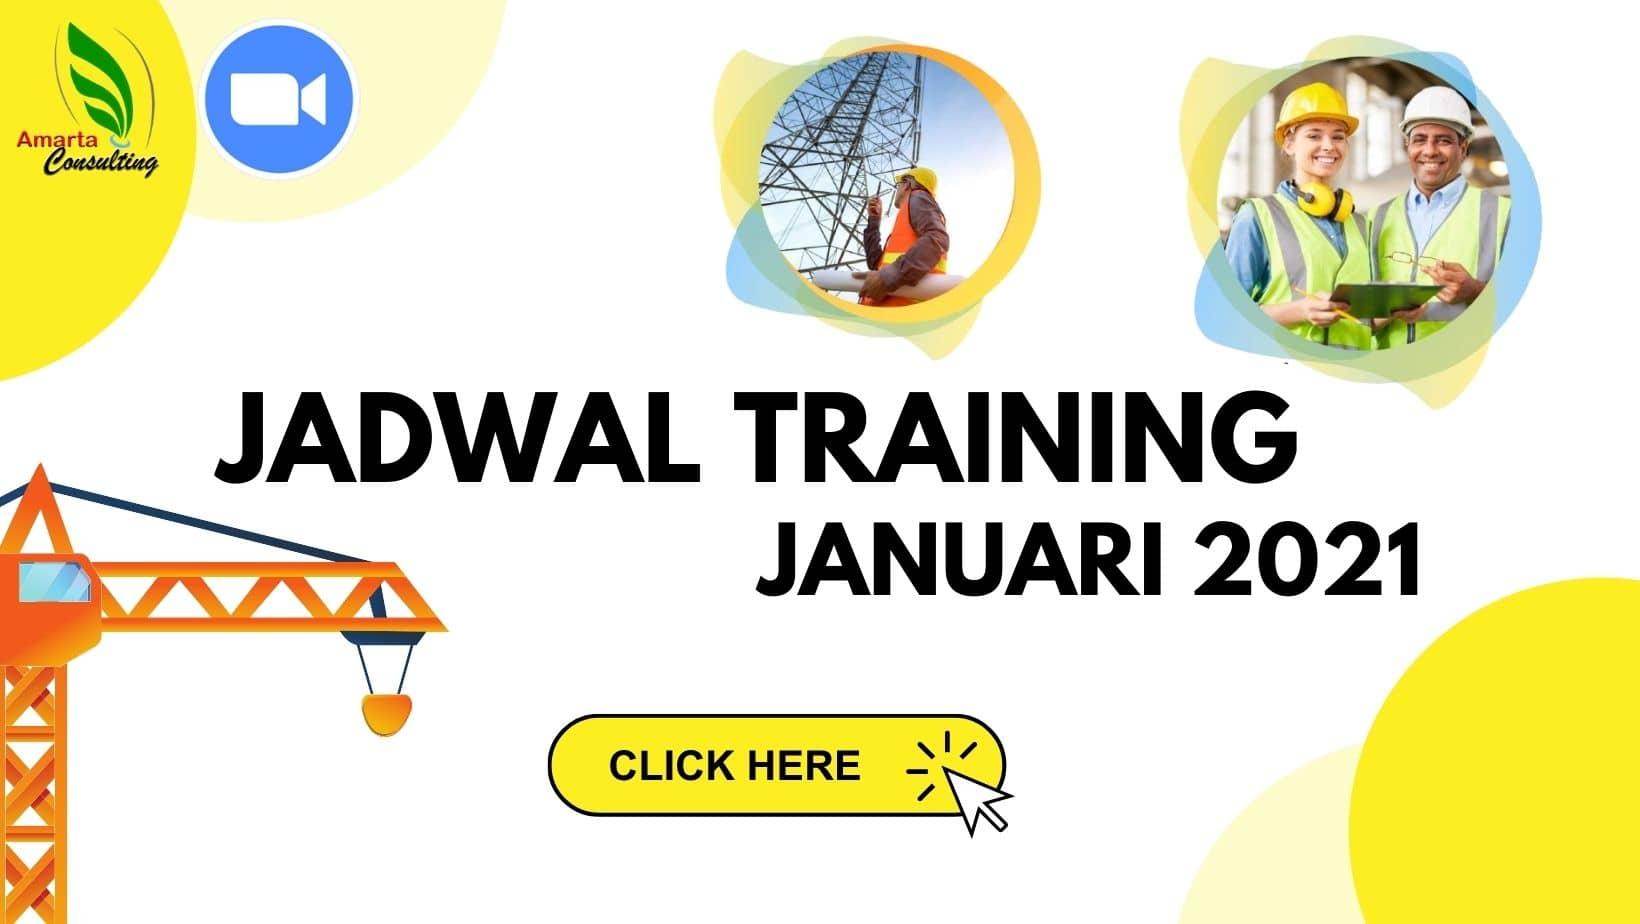 Jadwal Training Januari 2021